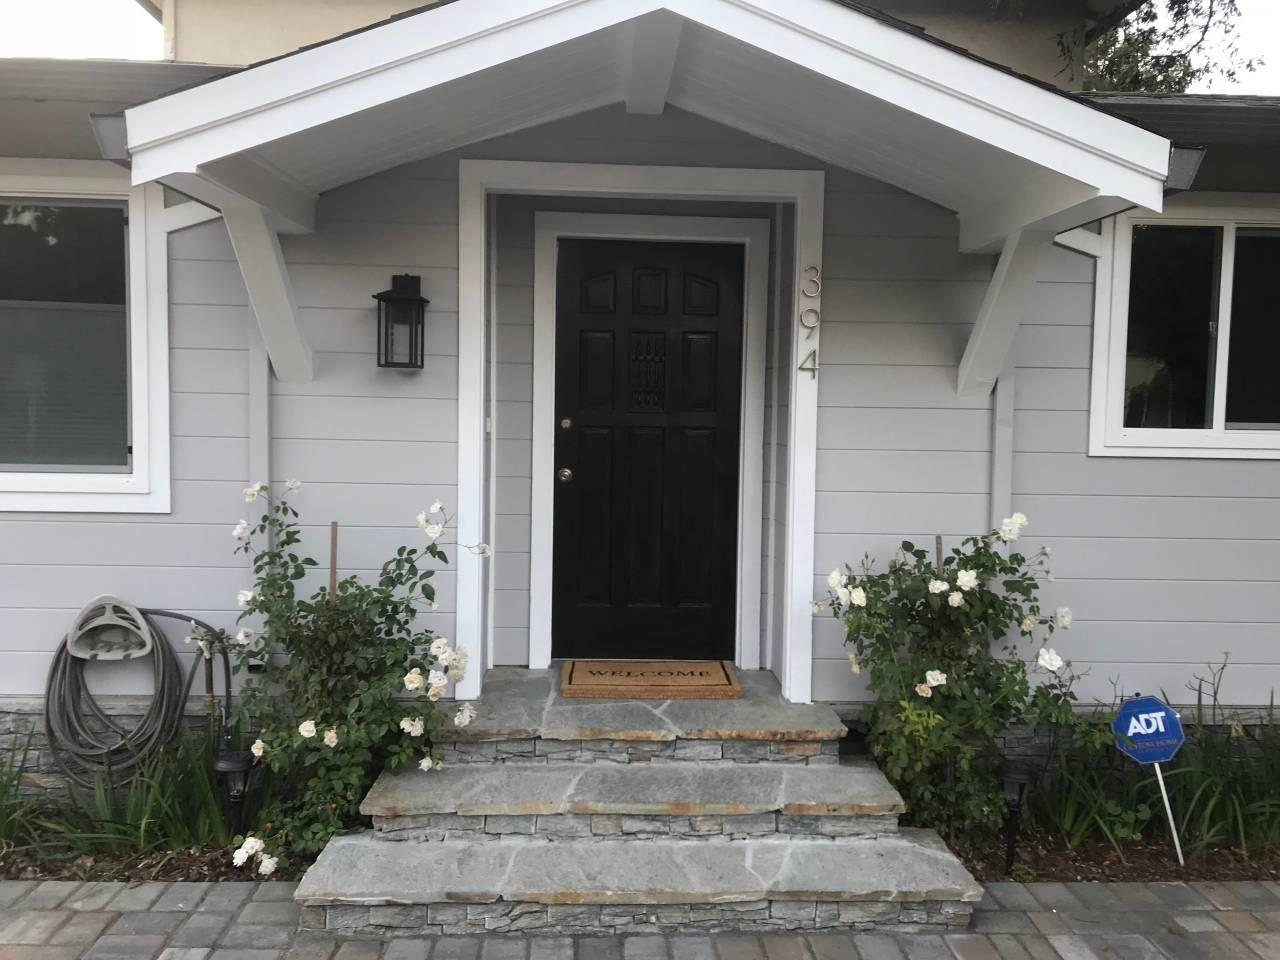 394 Mariposa Avenue Mountain View, CA 94041 - MLS #: ML81732931